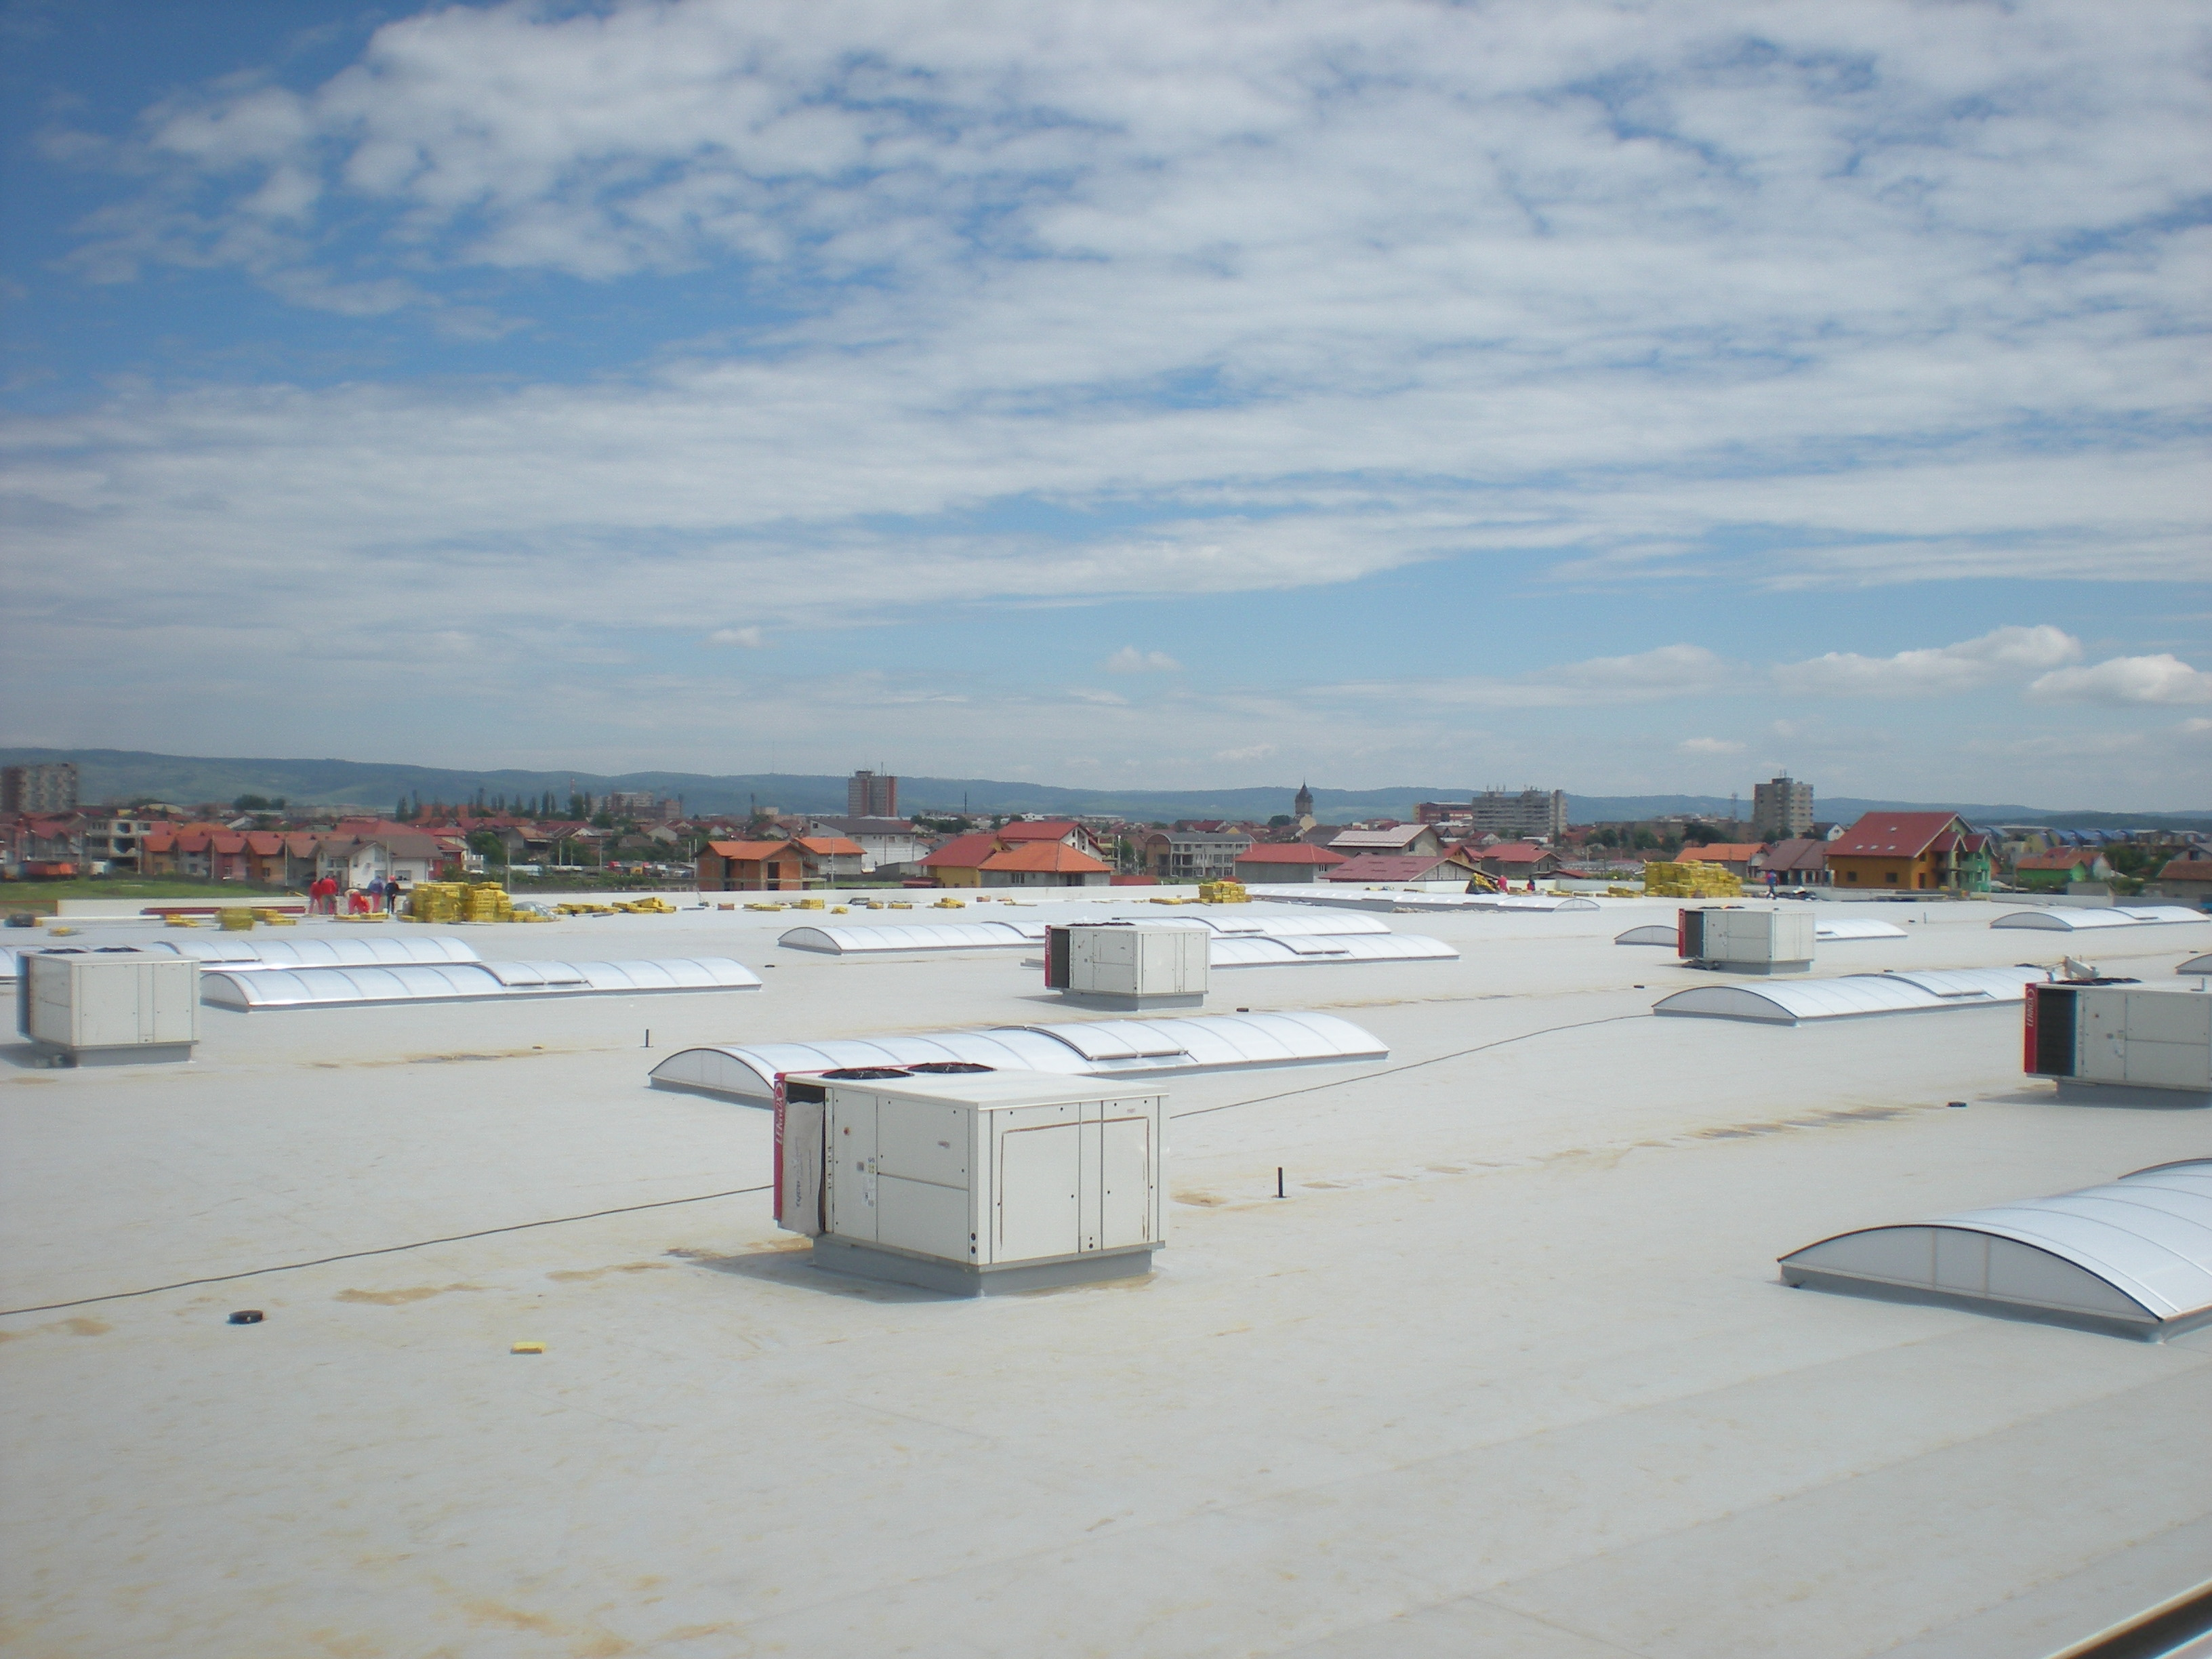 Luminatoare industriale - Spatiu comercial Carrefour - Drobeta Turnu Severin HEXADOME - Poza 2